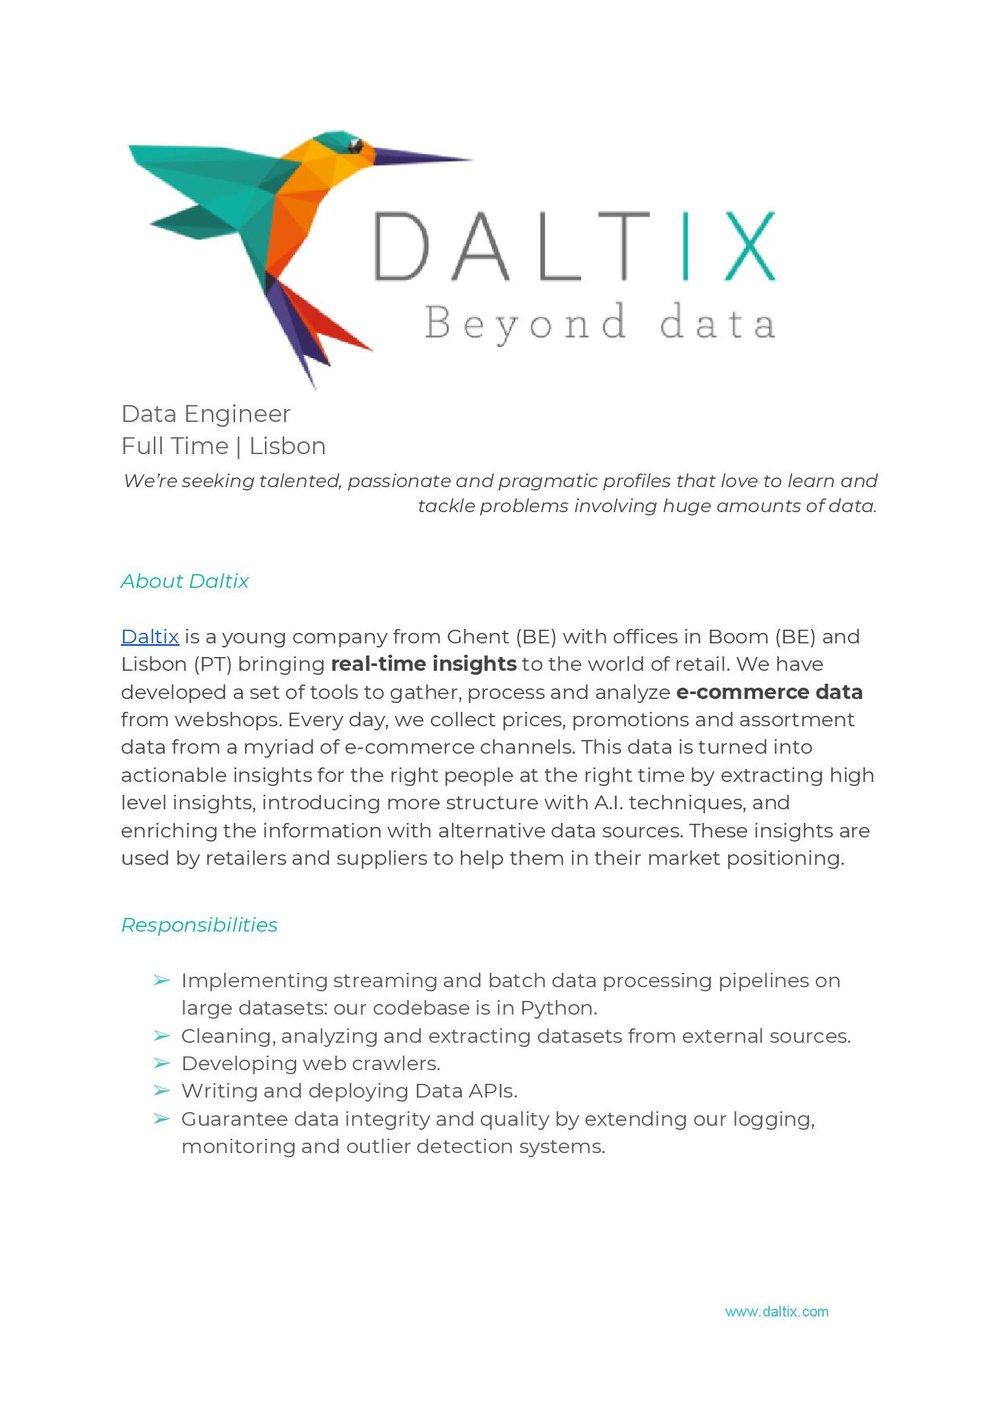 201801_Data_Engineer-page-001.jpg